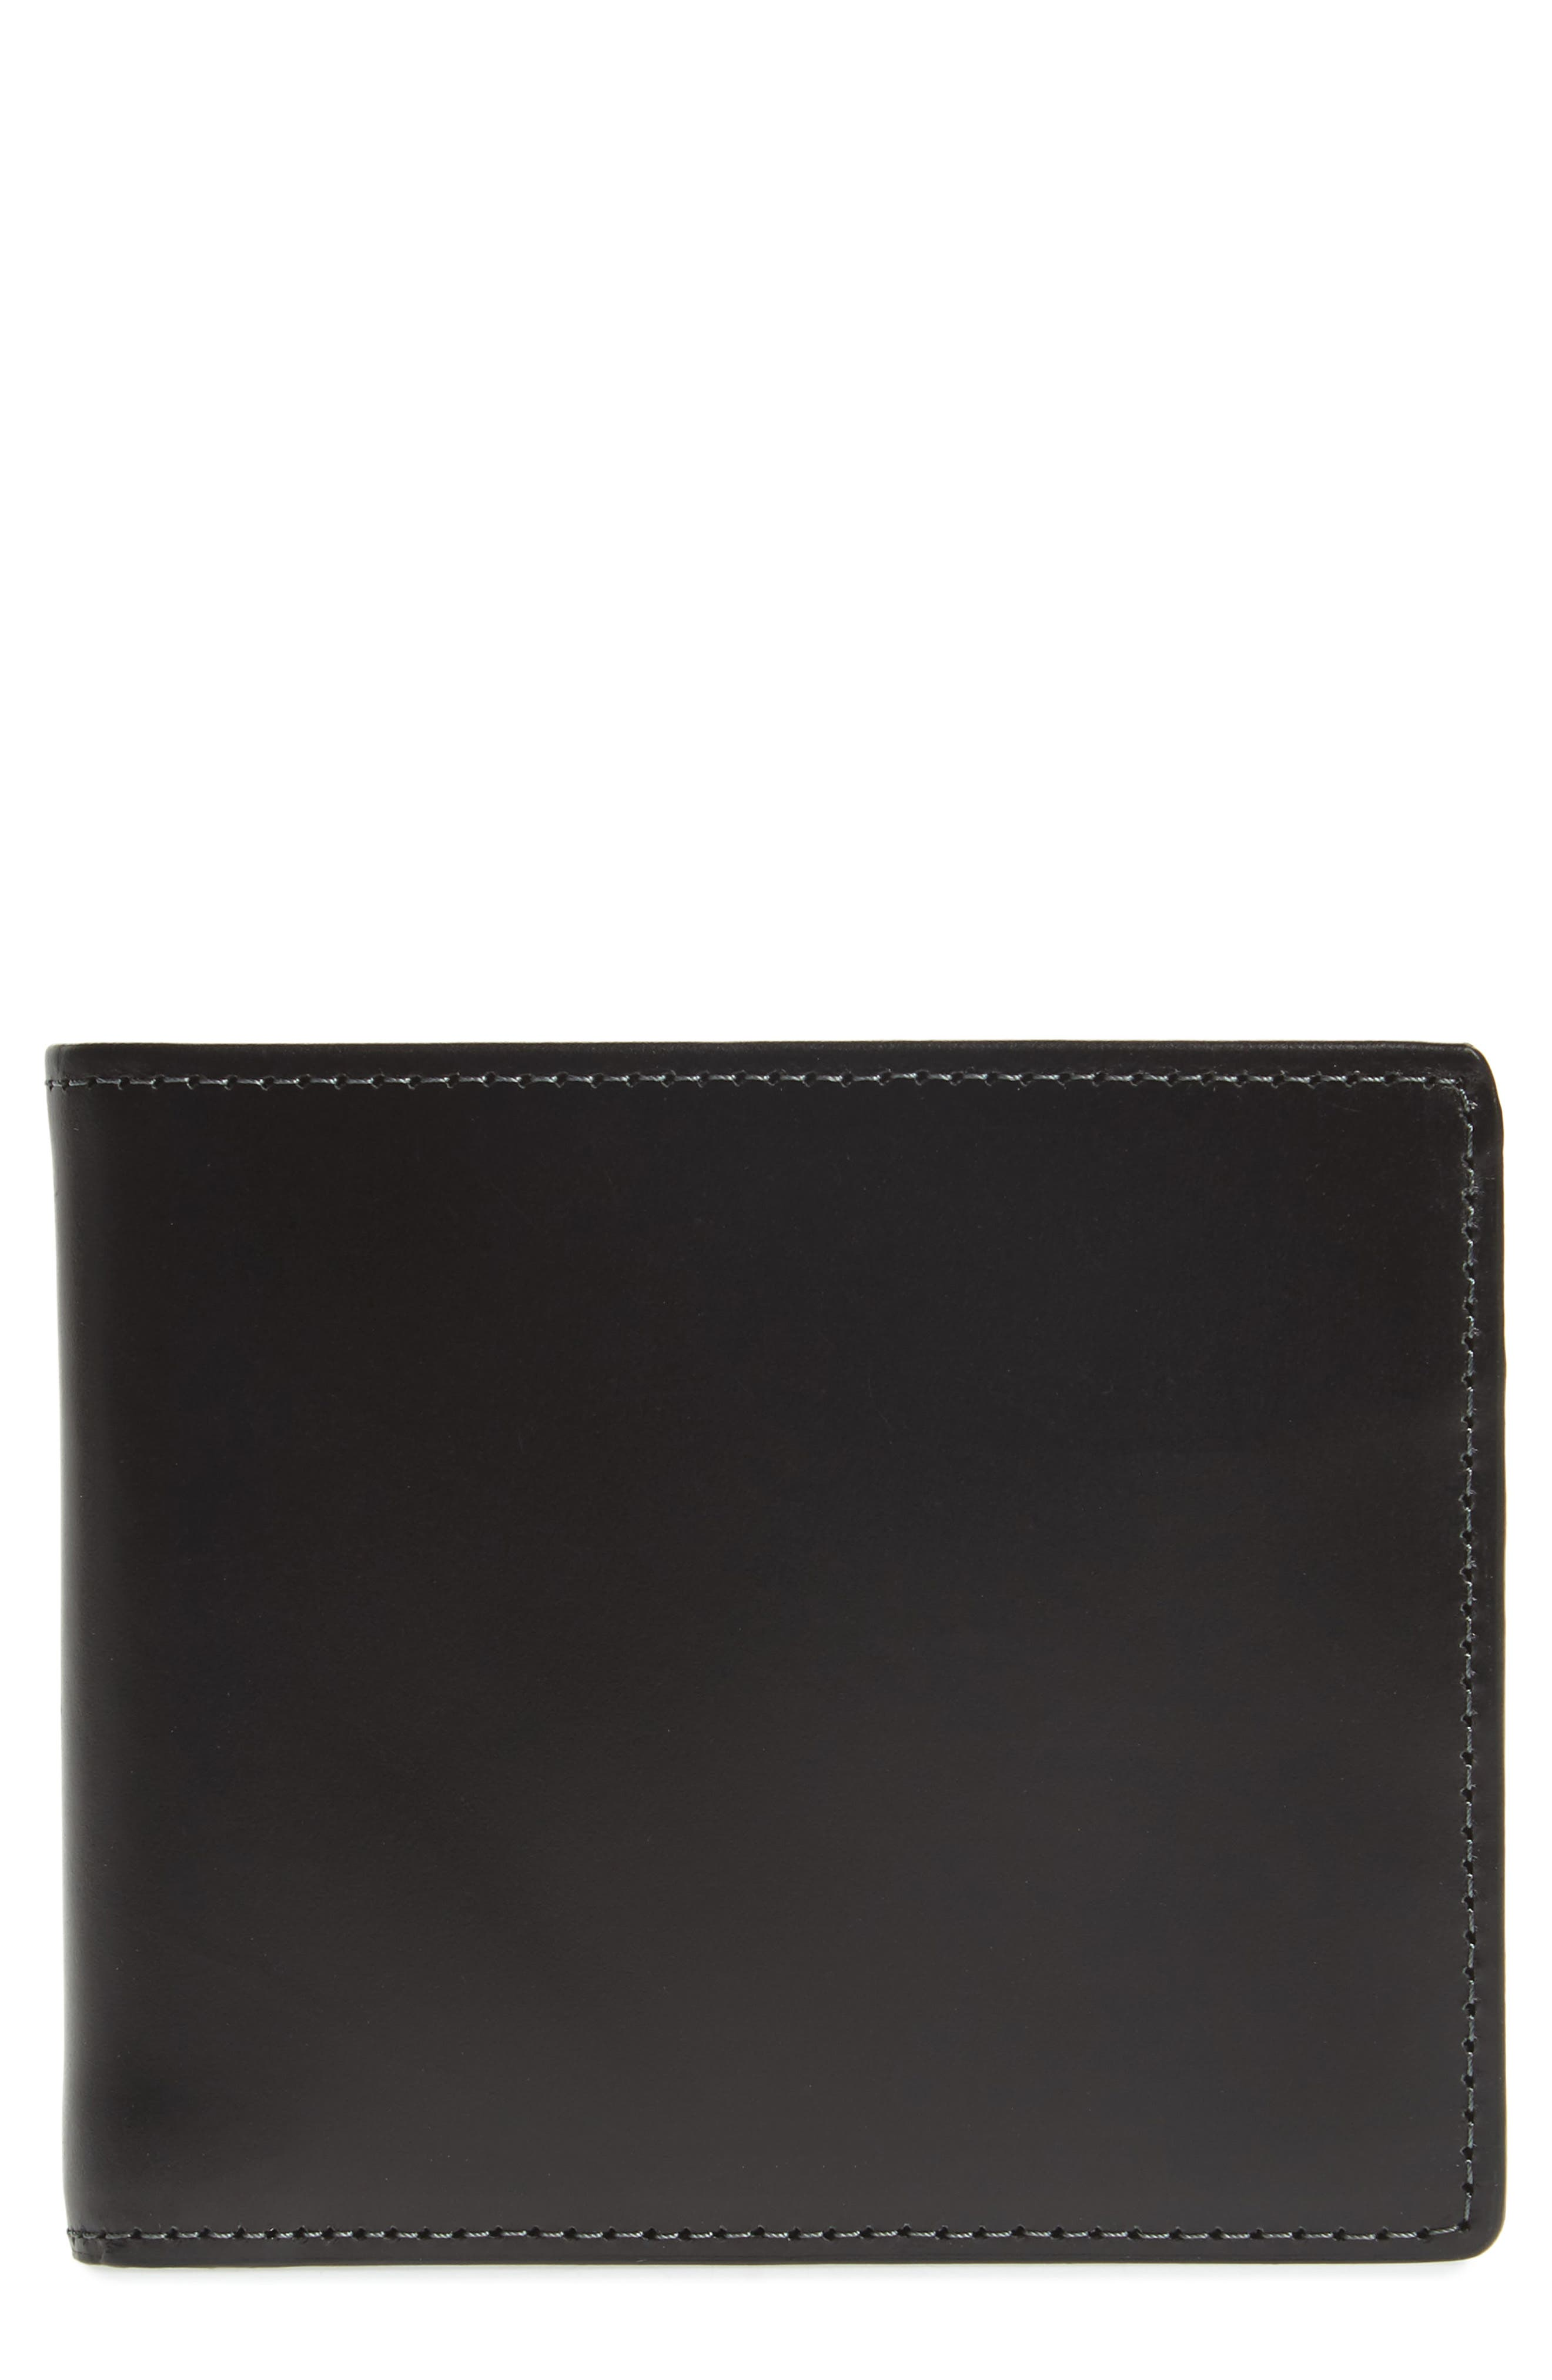 Nordstrom Men's Shop Weston Leather Wallet